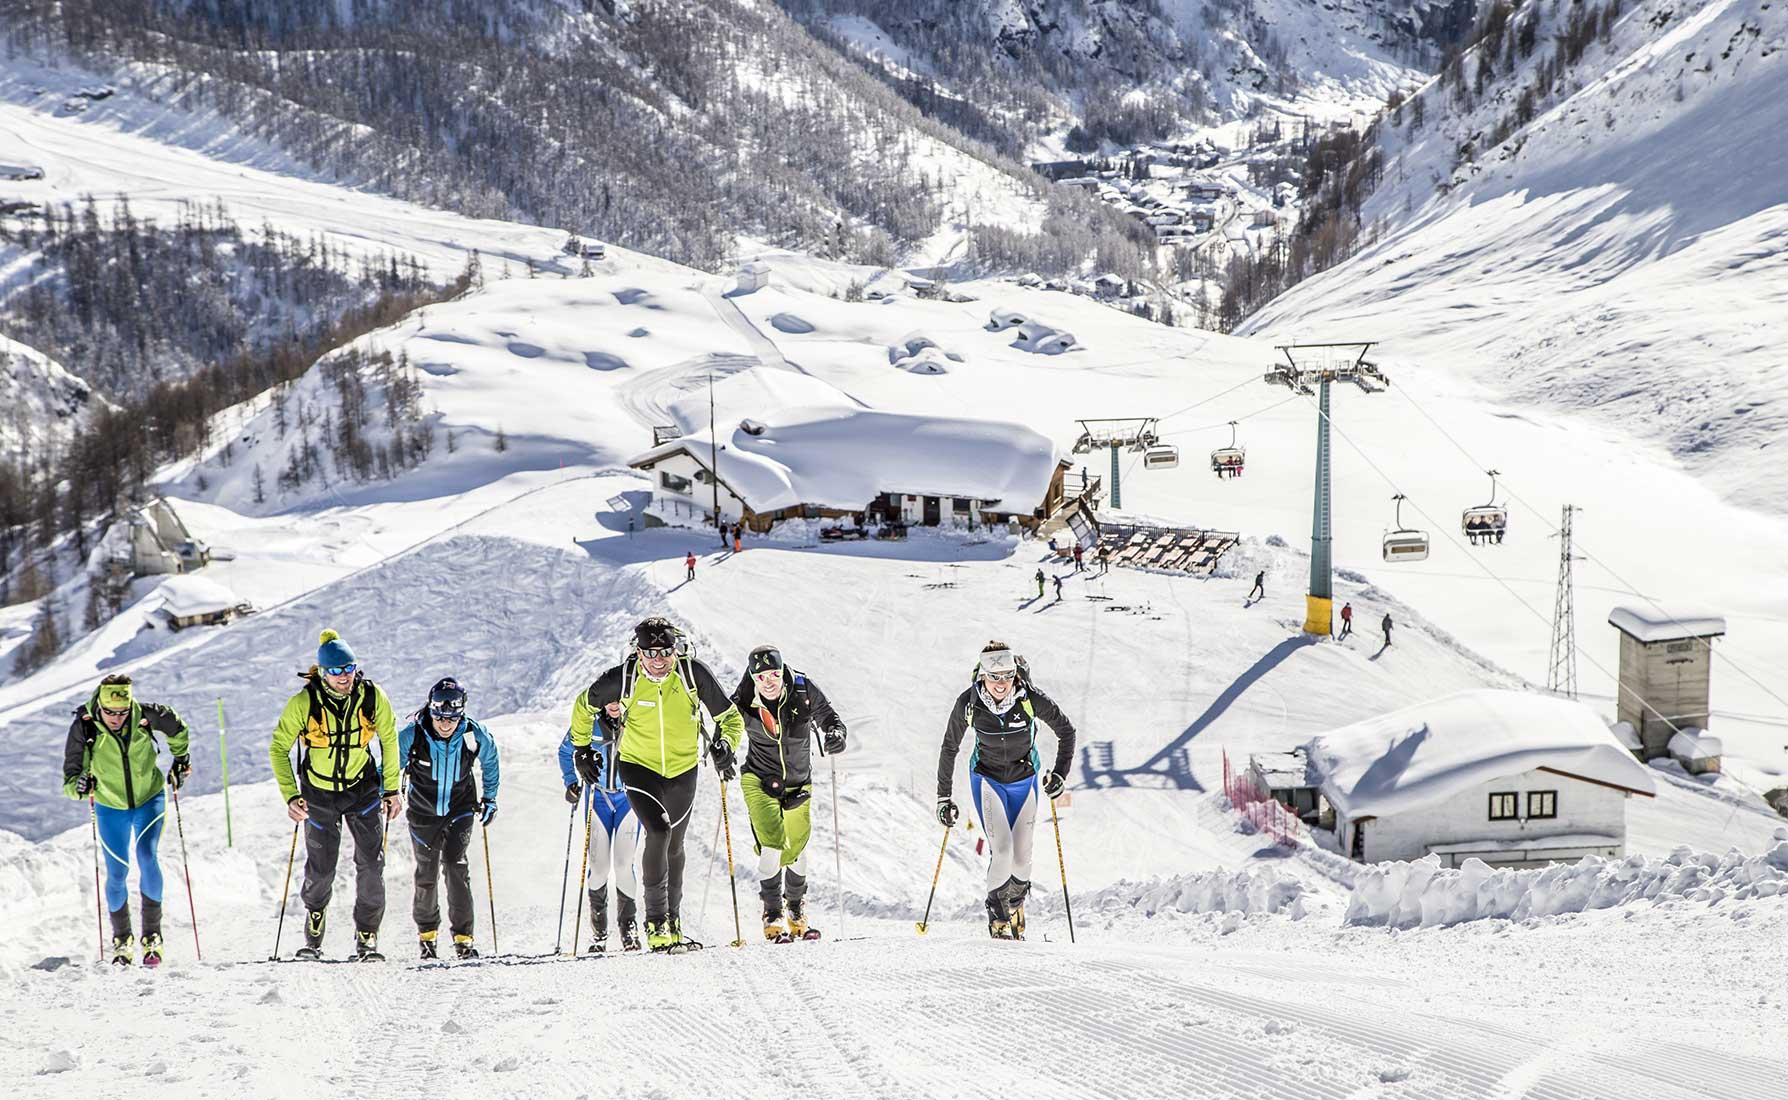 © Archivio Fotografico Monterosa Ski